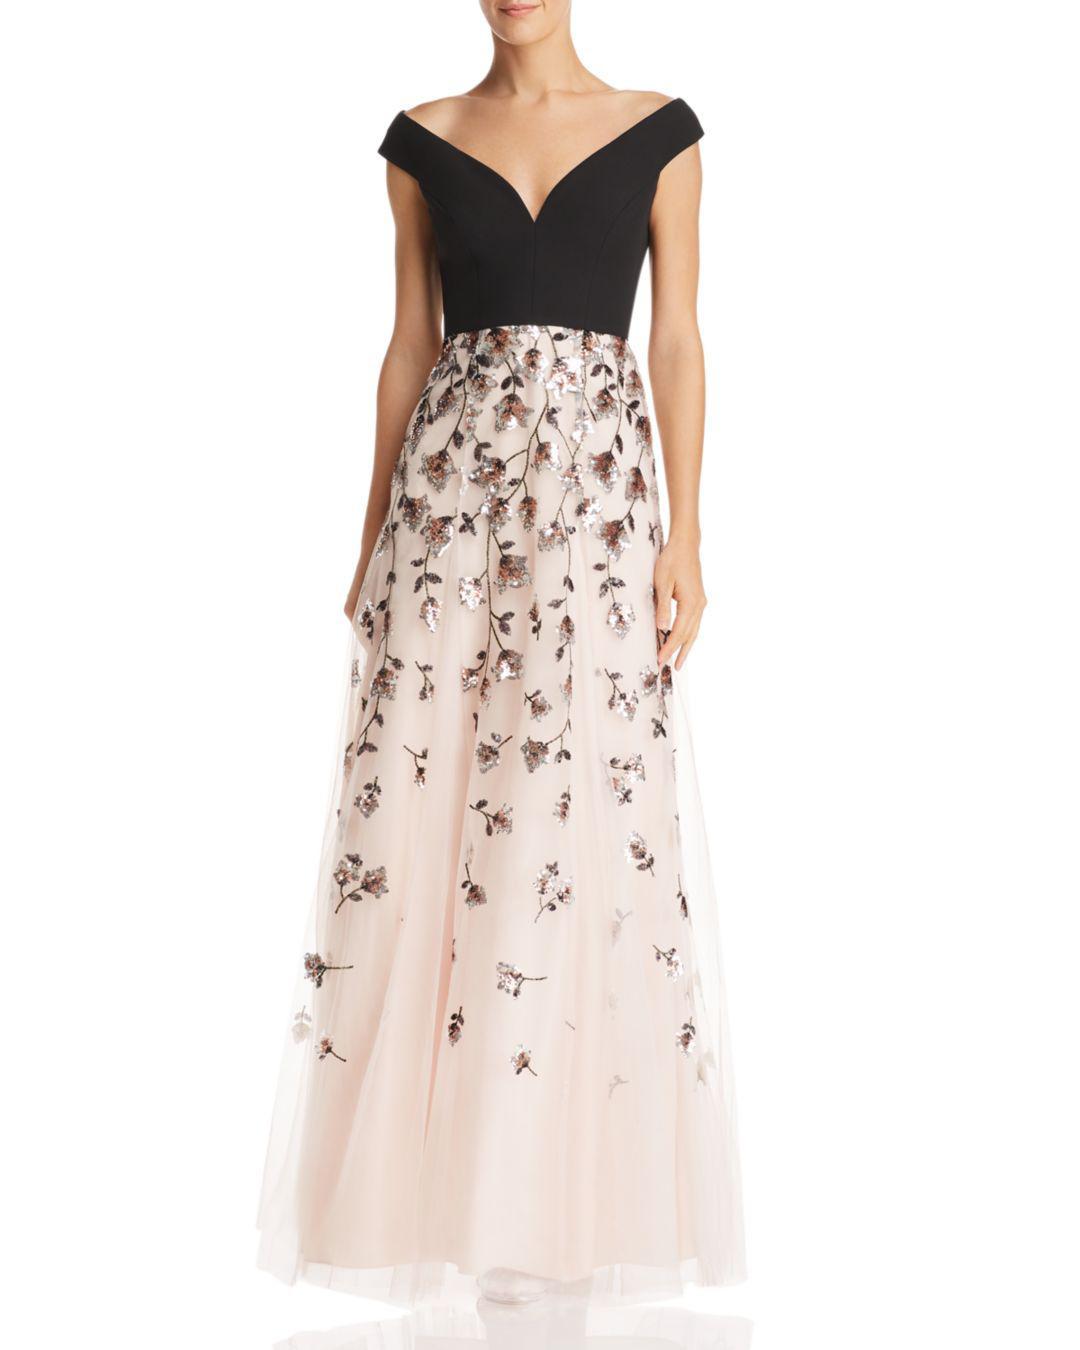 ec1ffbc620 BCBGMAXAZRIA. Women s Embellished Off-the-shoulder Gown